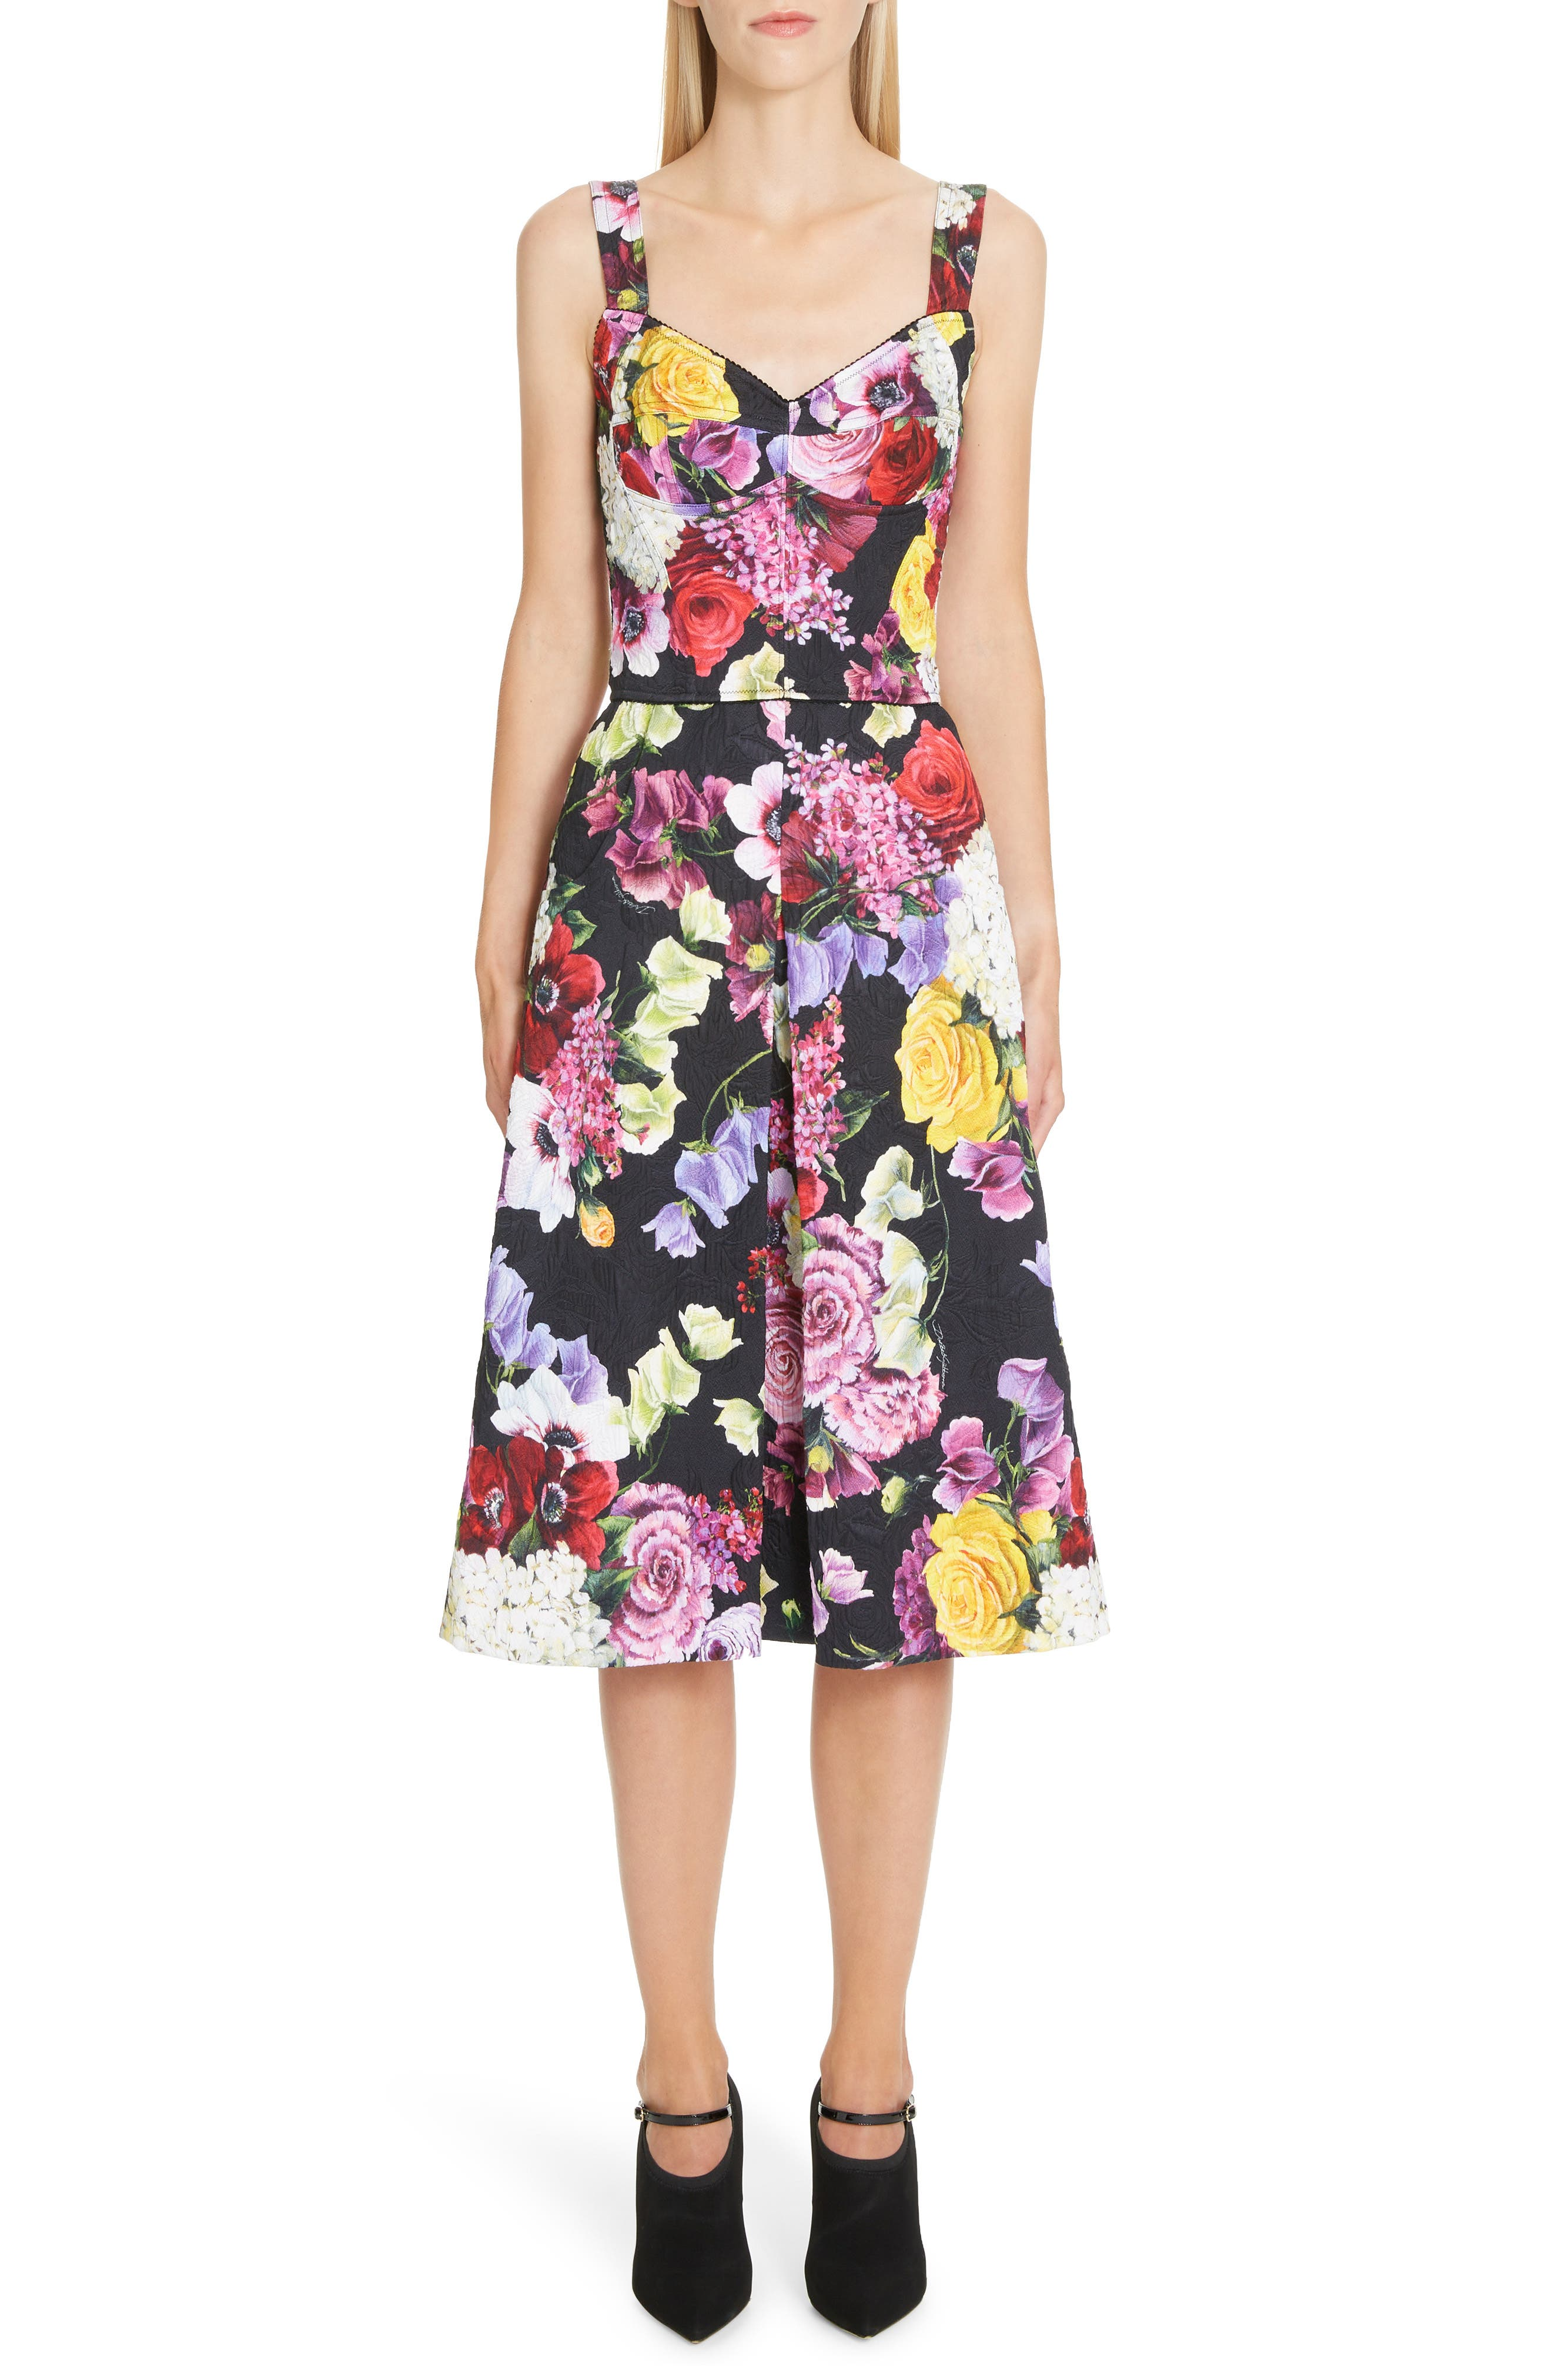 Floral Print Brocade Bustier Dress,                             Main thumbnail 1, color,                             HNW86 BLACK FLORAL